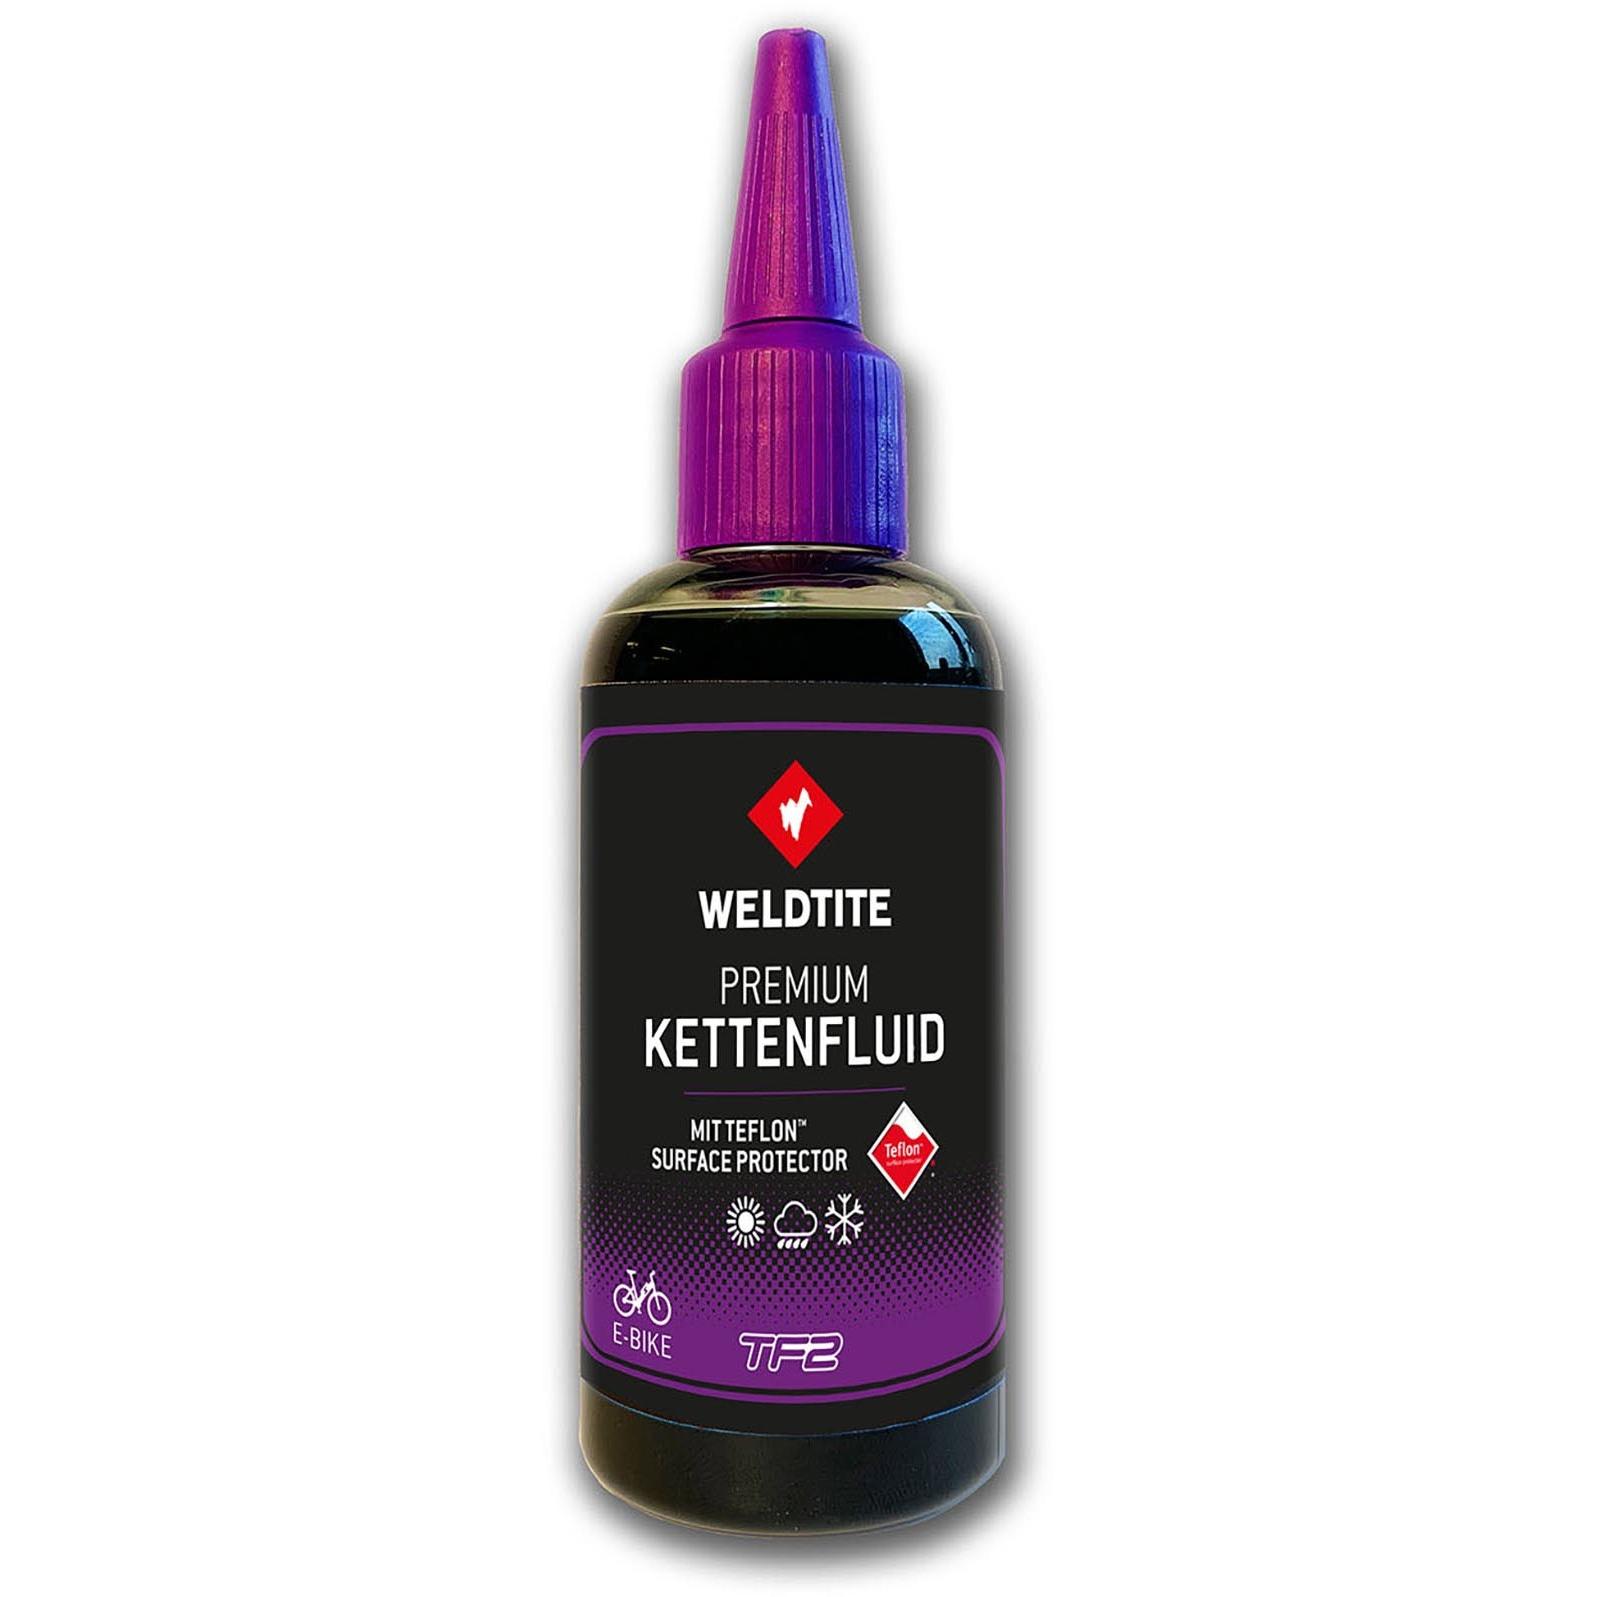 WELDTITE Premium Kettenfluid 100ml